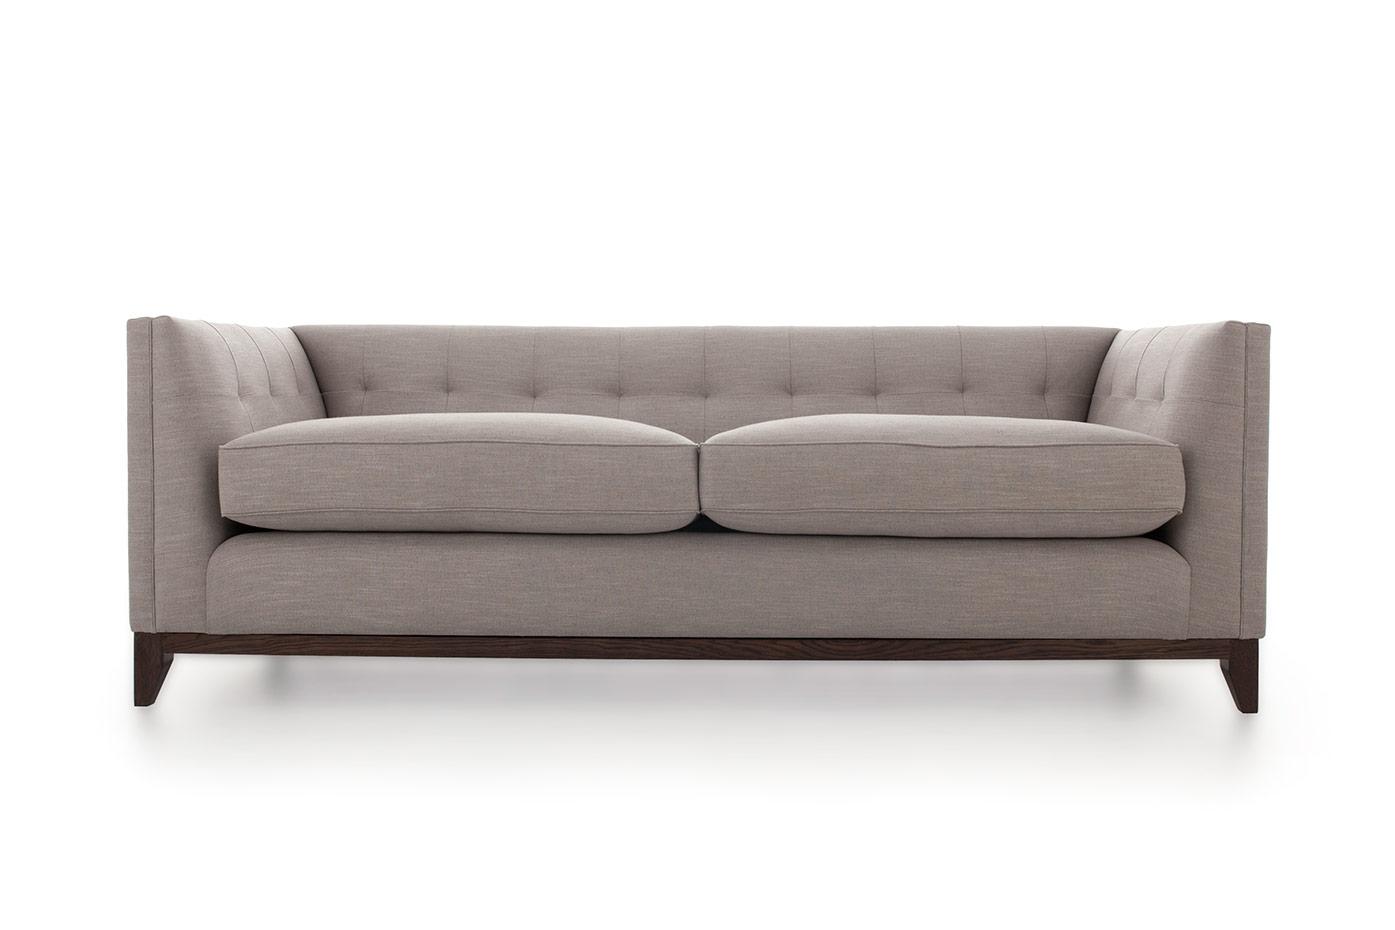 Byron sofa range for Sofa cama medellin